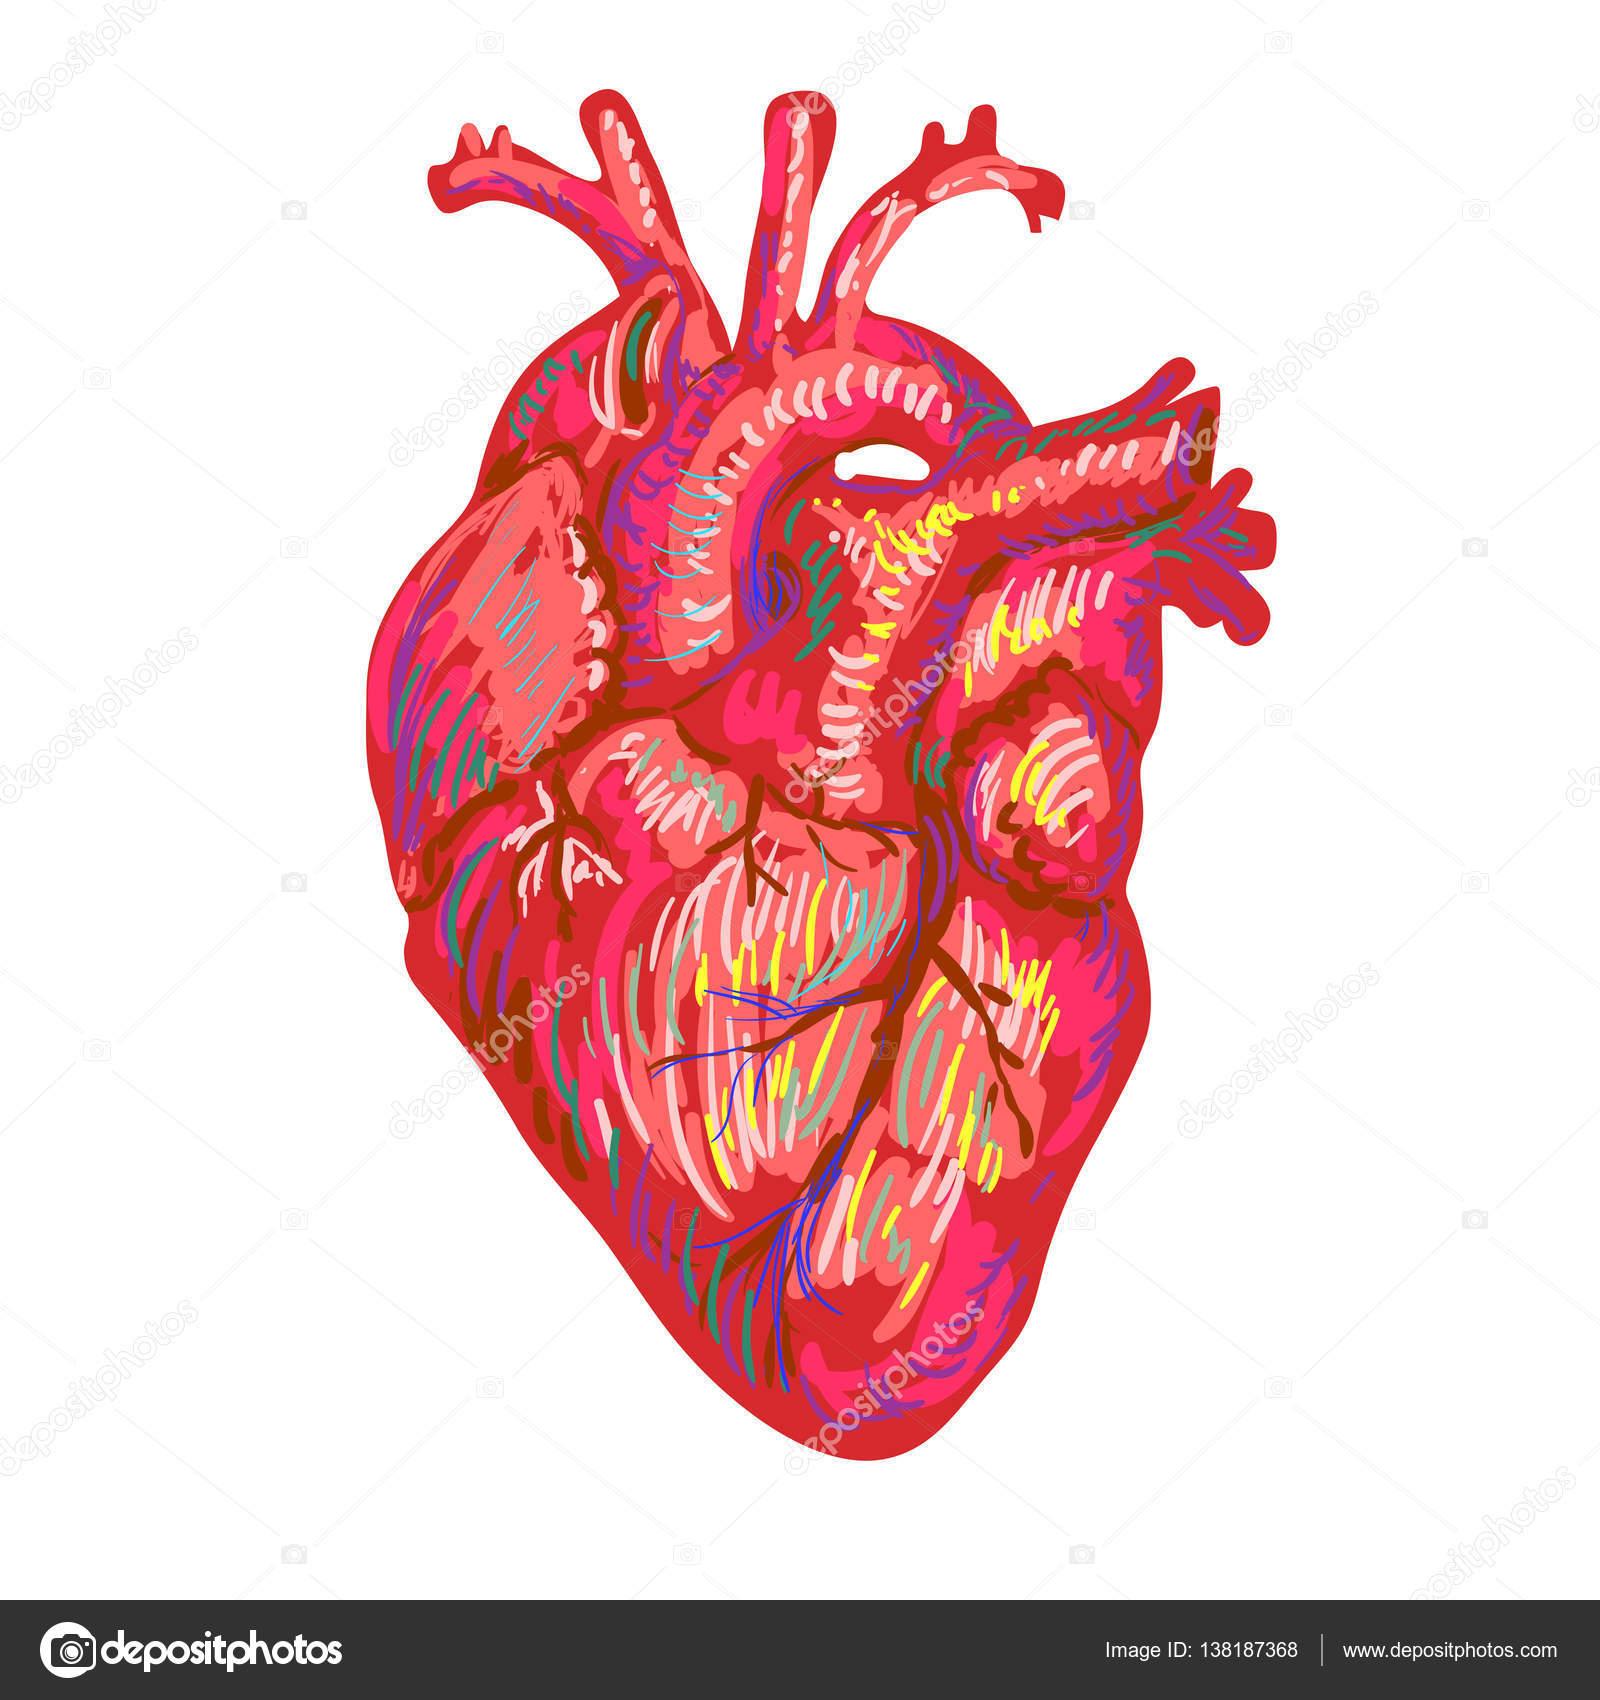 Dibujos Corazon Humano Dibujo Del Bosquejo Del Corazón Humano